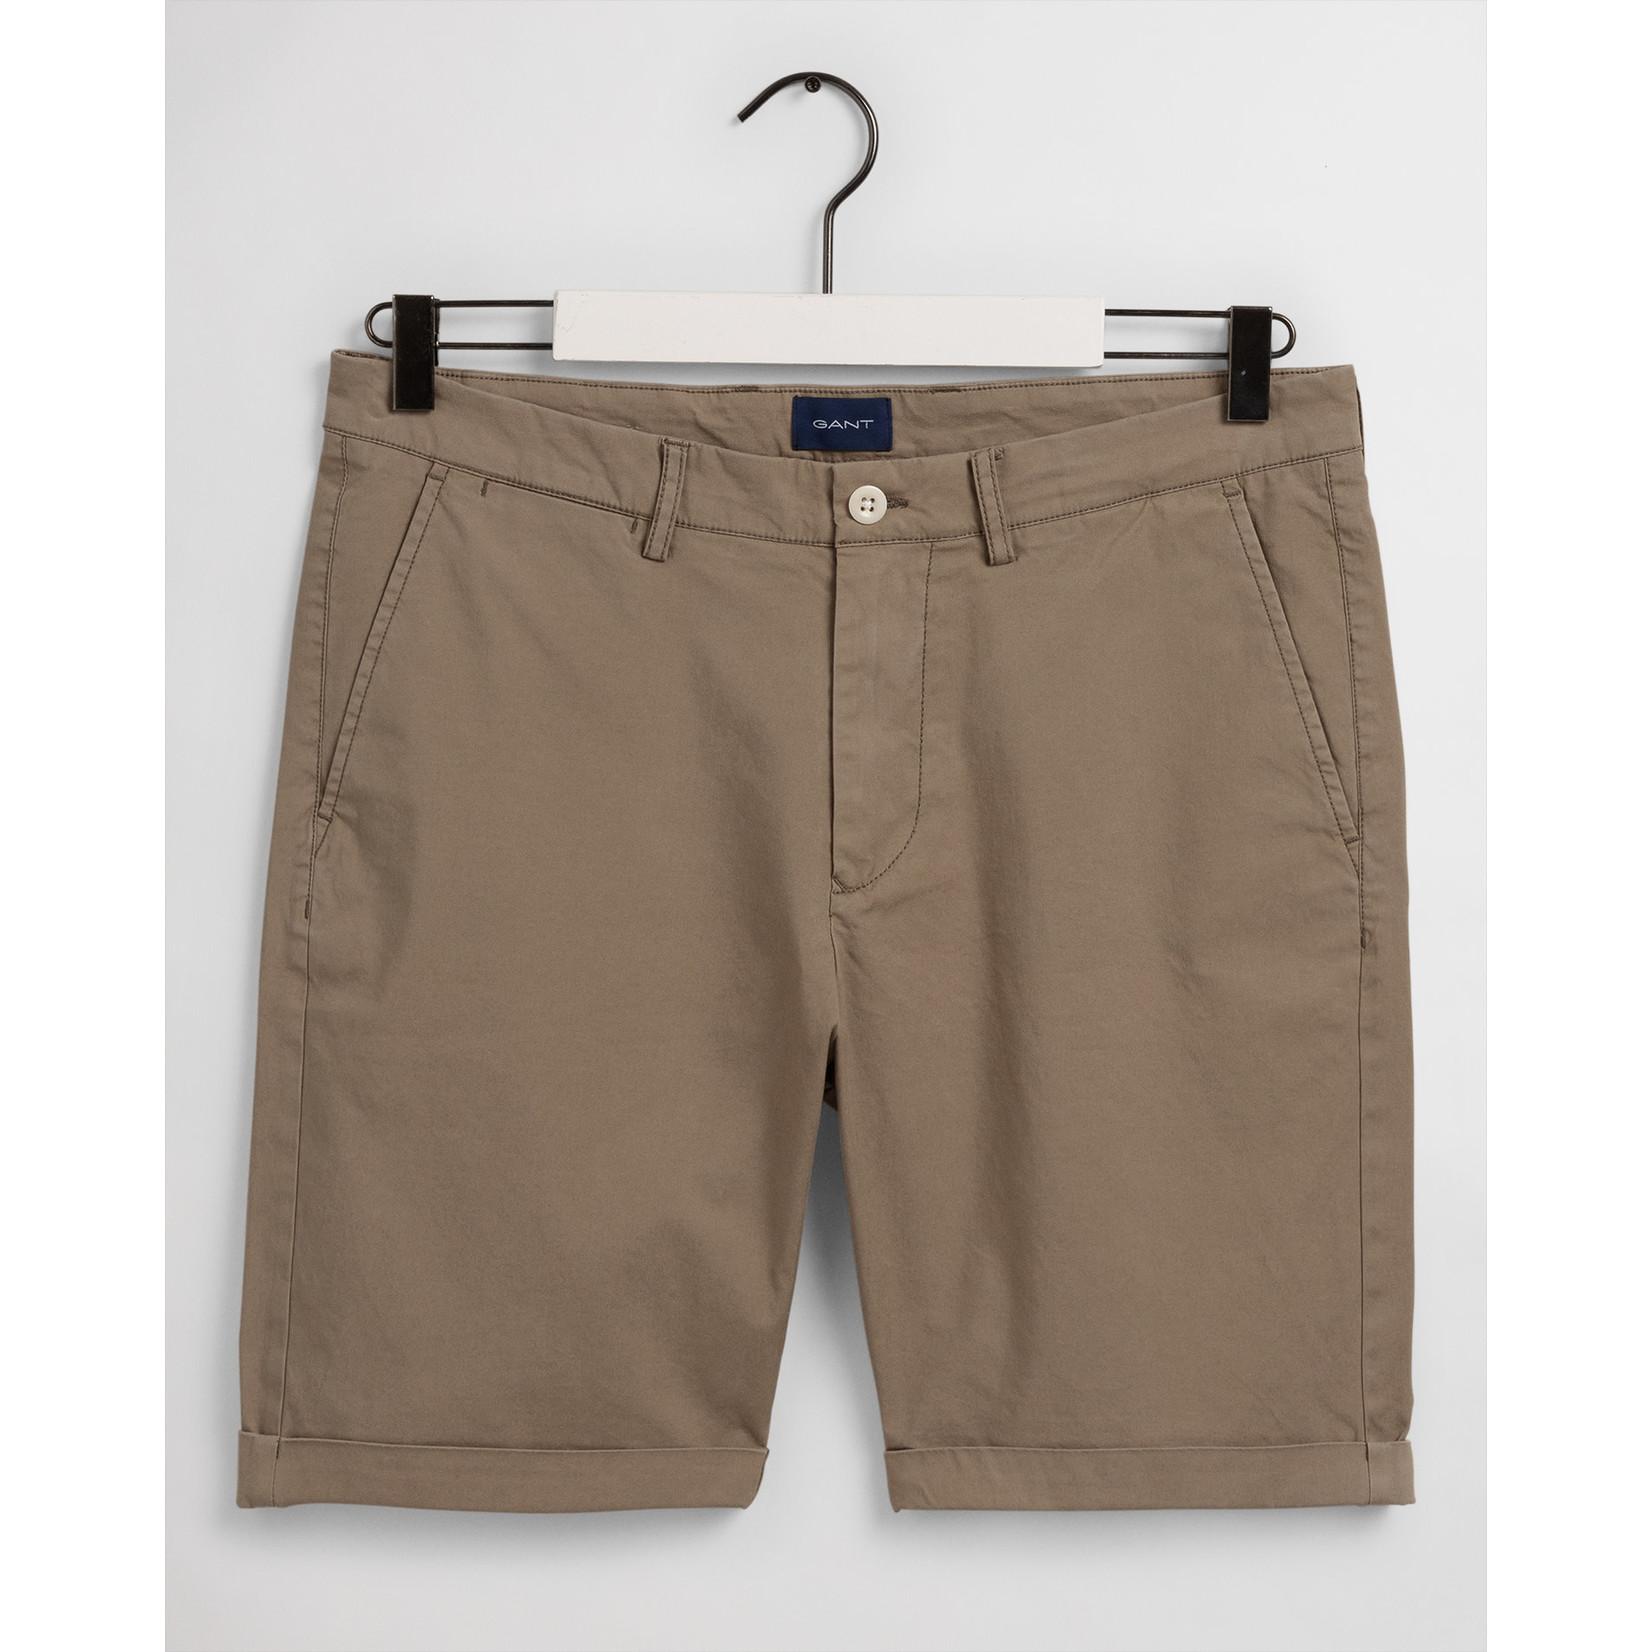 GANT korte broek khaki